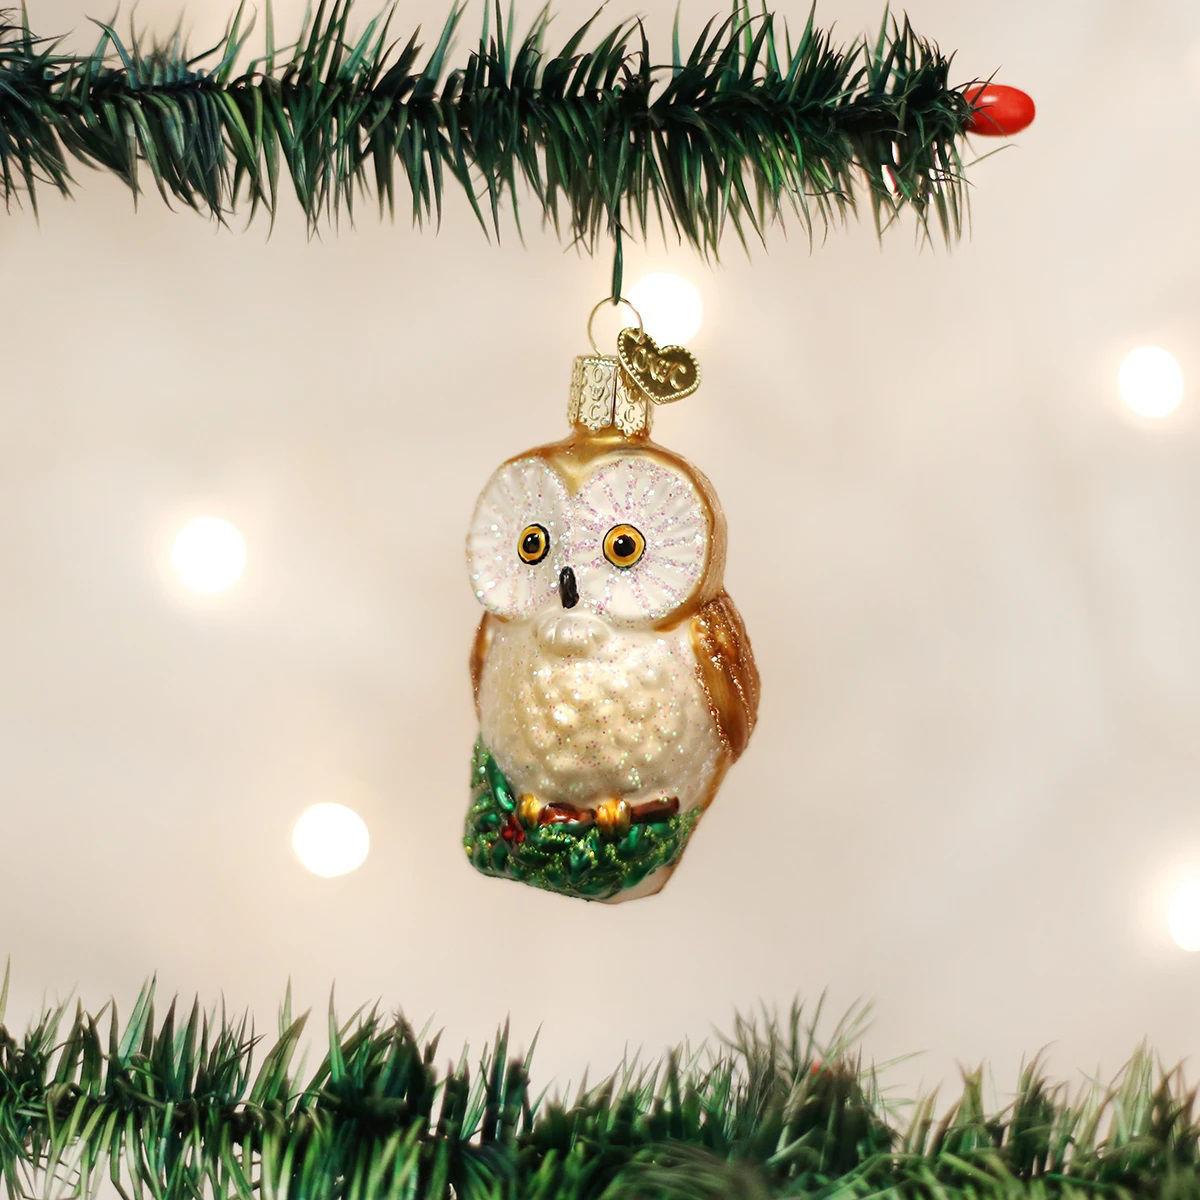 Christmas Owl Ornament by Old World Christmas